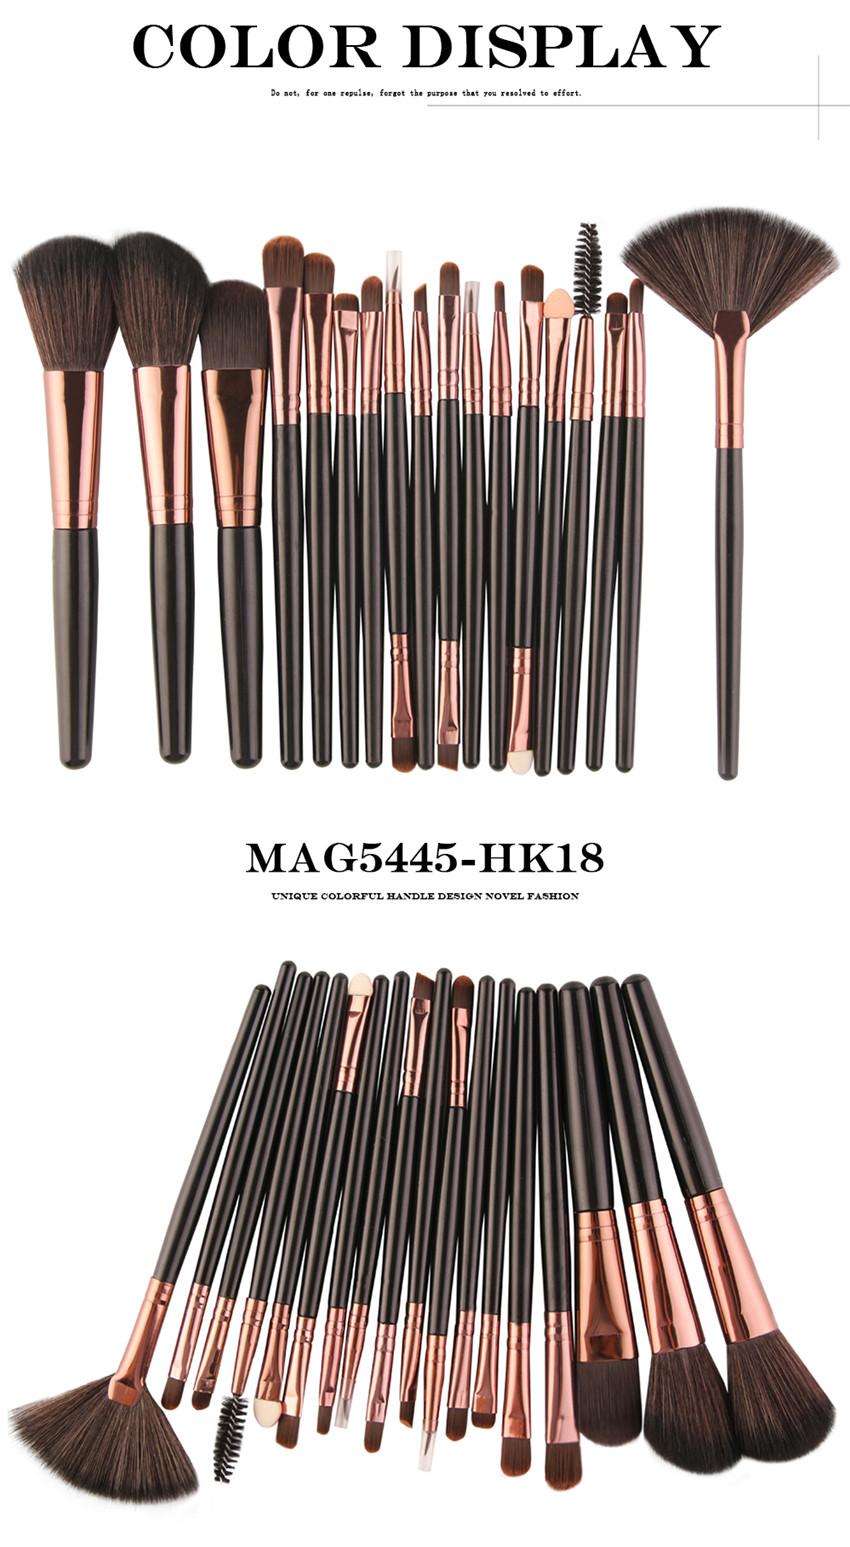 18Pcs/lot Brand Brushes Makeup Brush Set maquiagem Cosmetics Power Foundation Blush Eye Shadow Blending Fan Make Up Kits Beauty 12